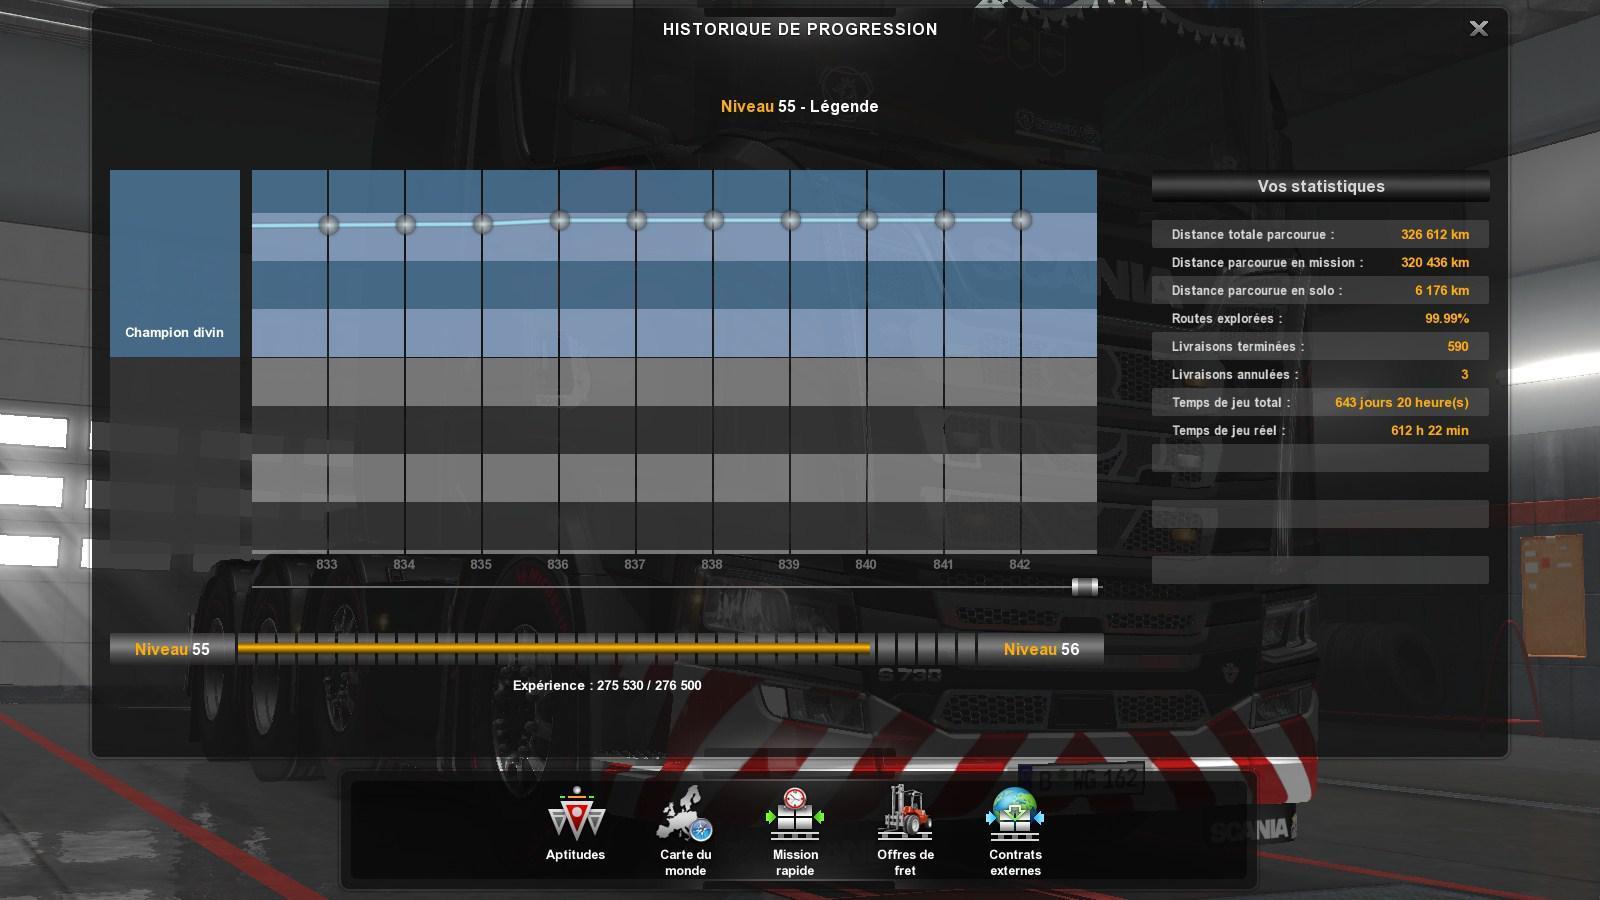 ETS2 – 1 35 NO DLC FINISHED SAVE GAME PROFILE » GamesMods